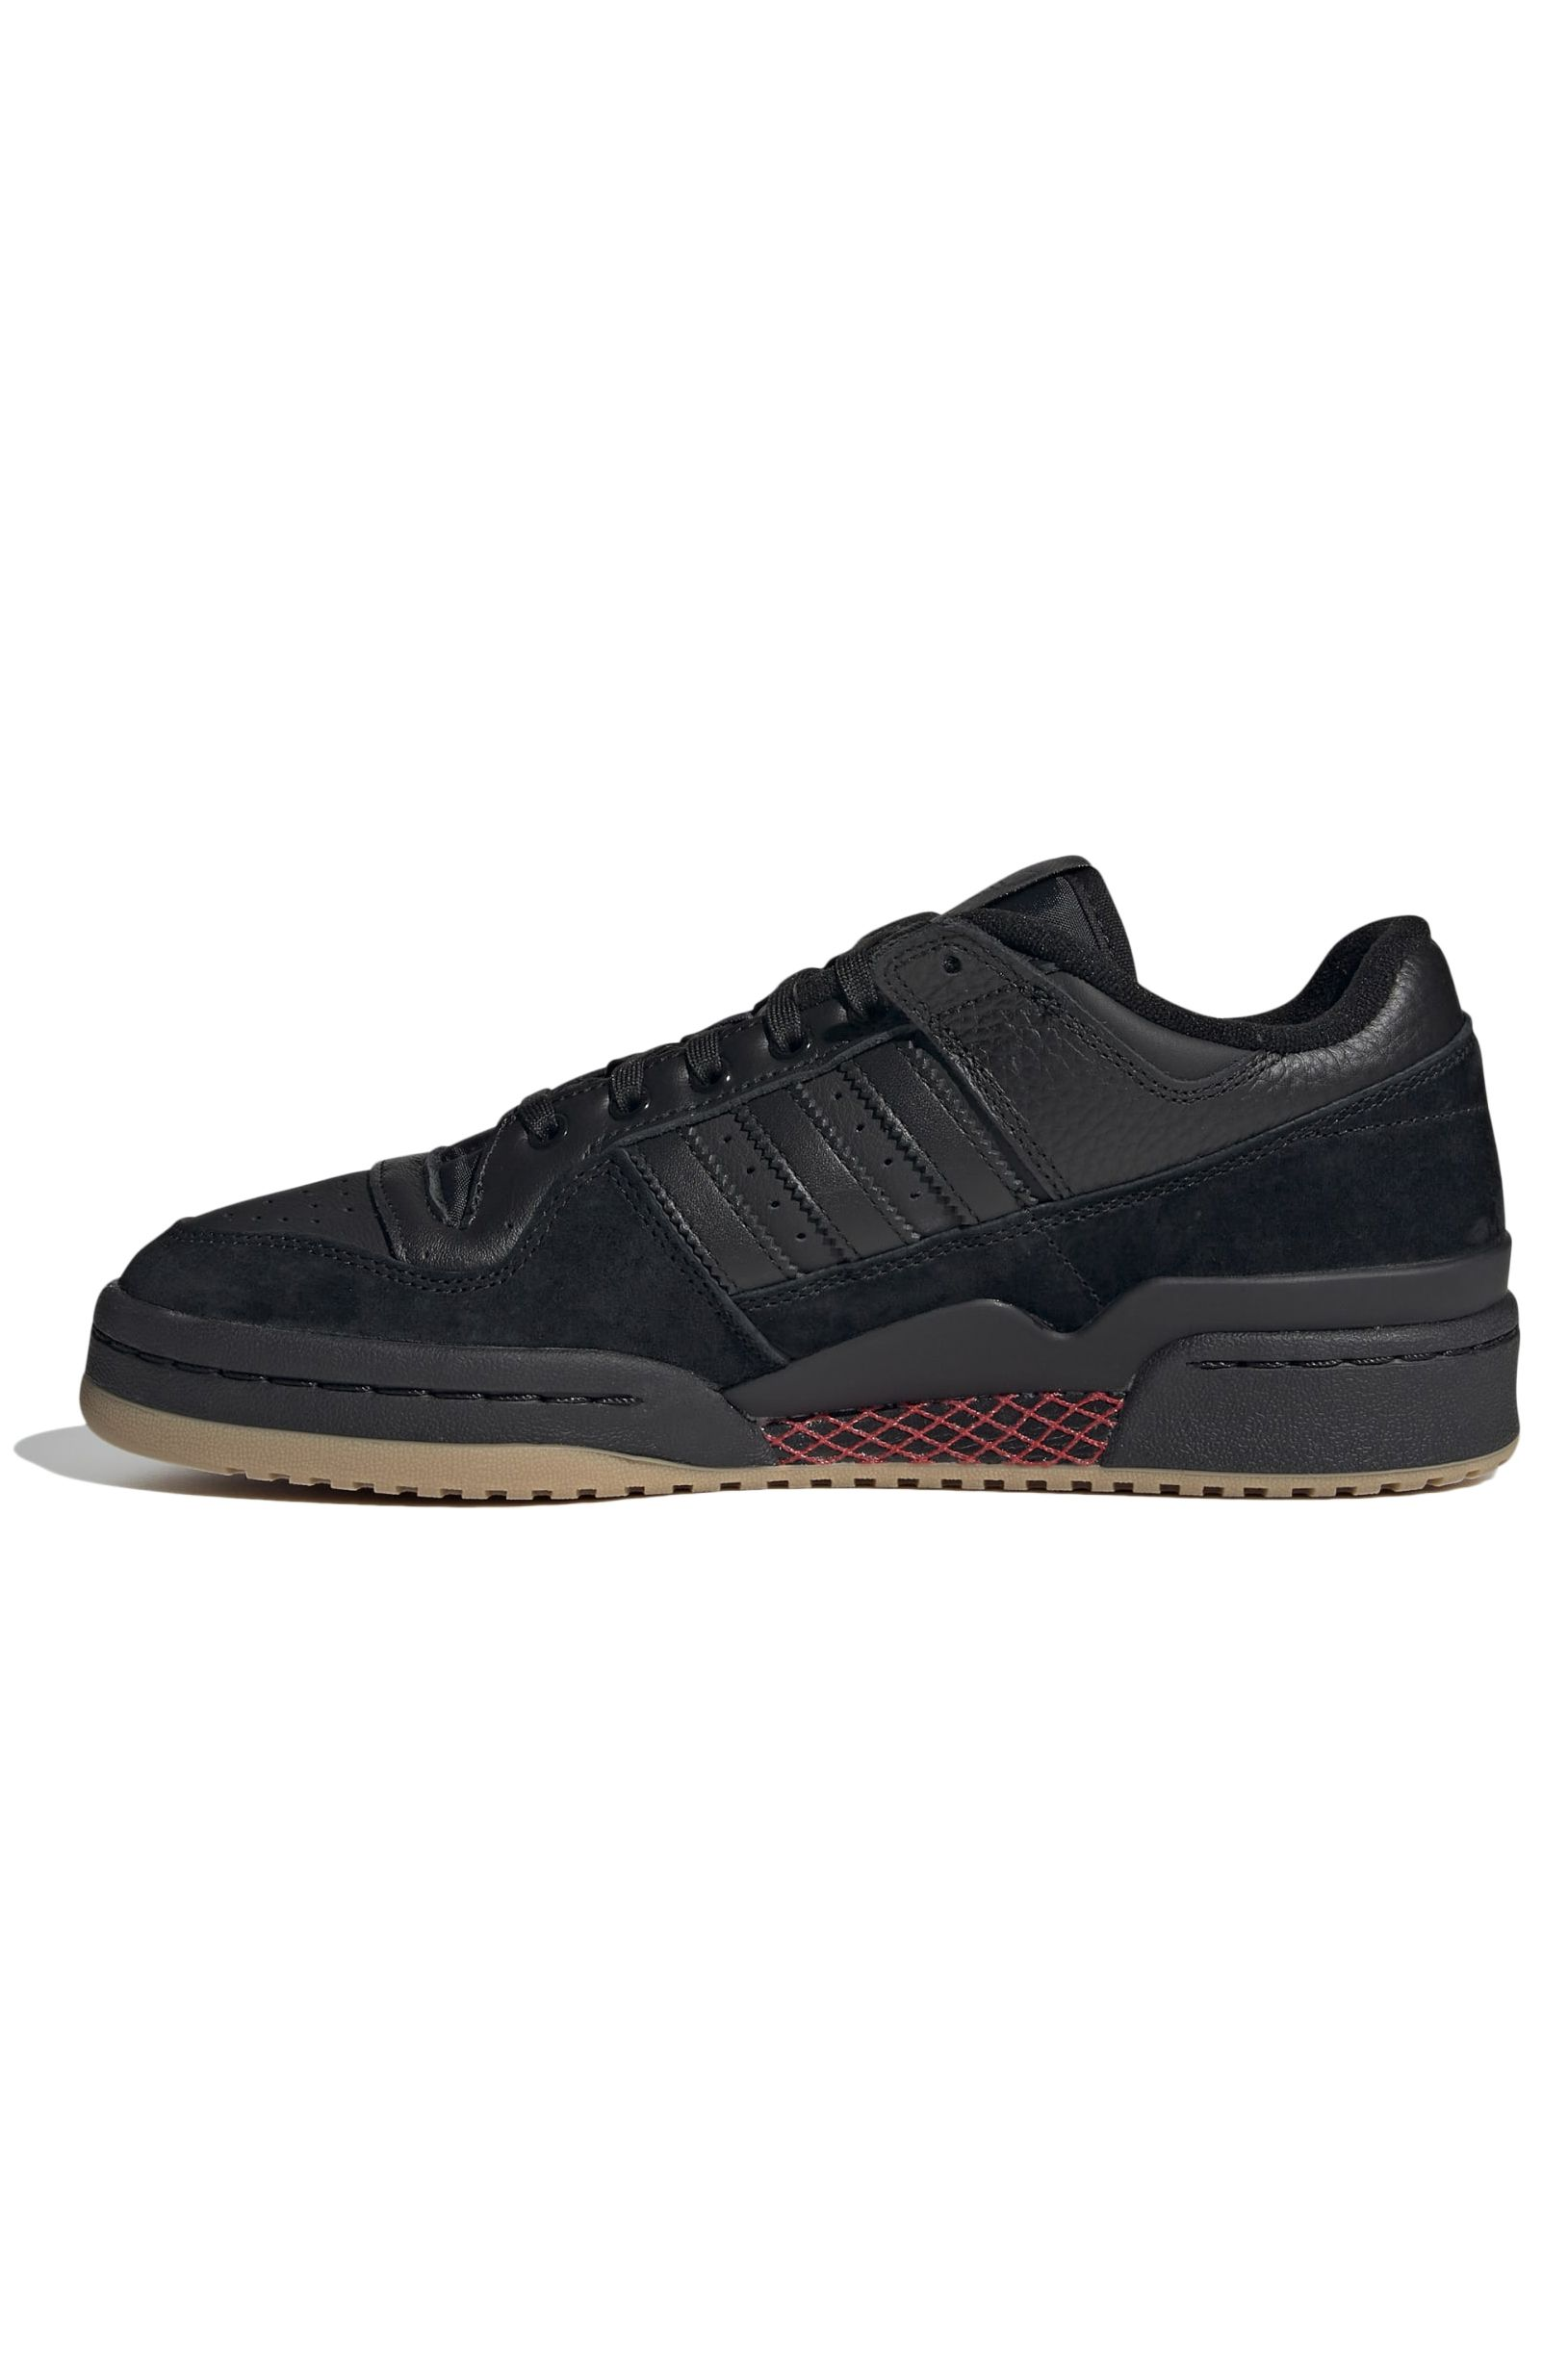 Tenis Adidas FORUM 84 LOW ADV Core Black/Core Black/Vivid Red